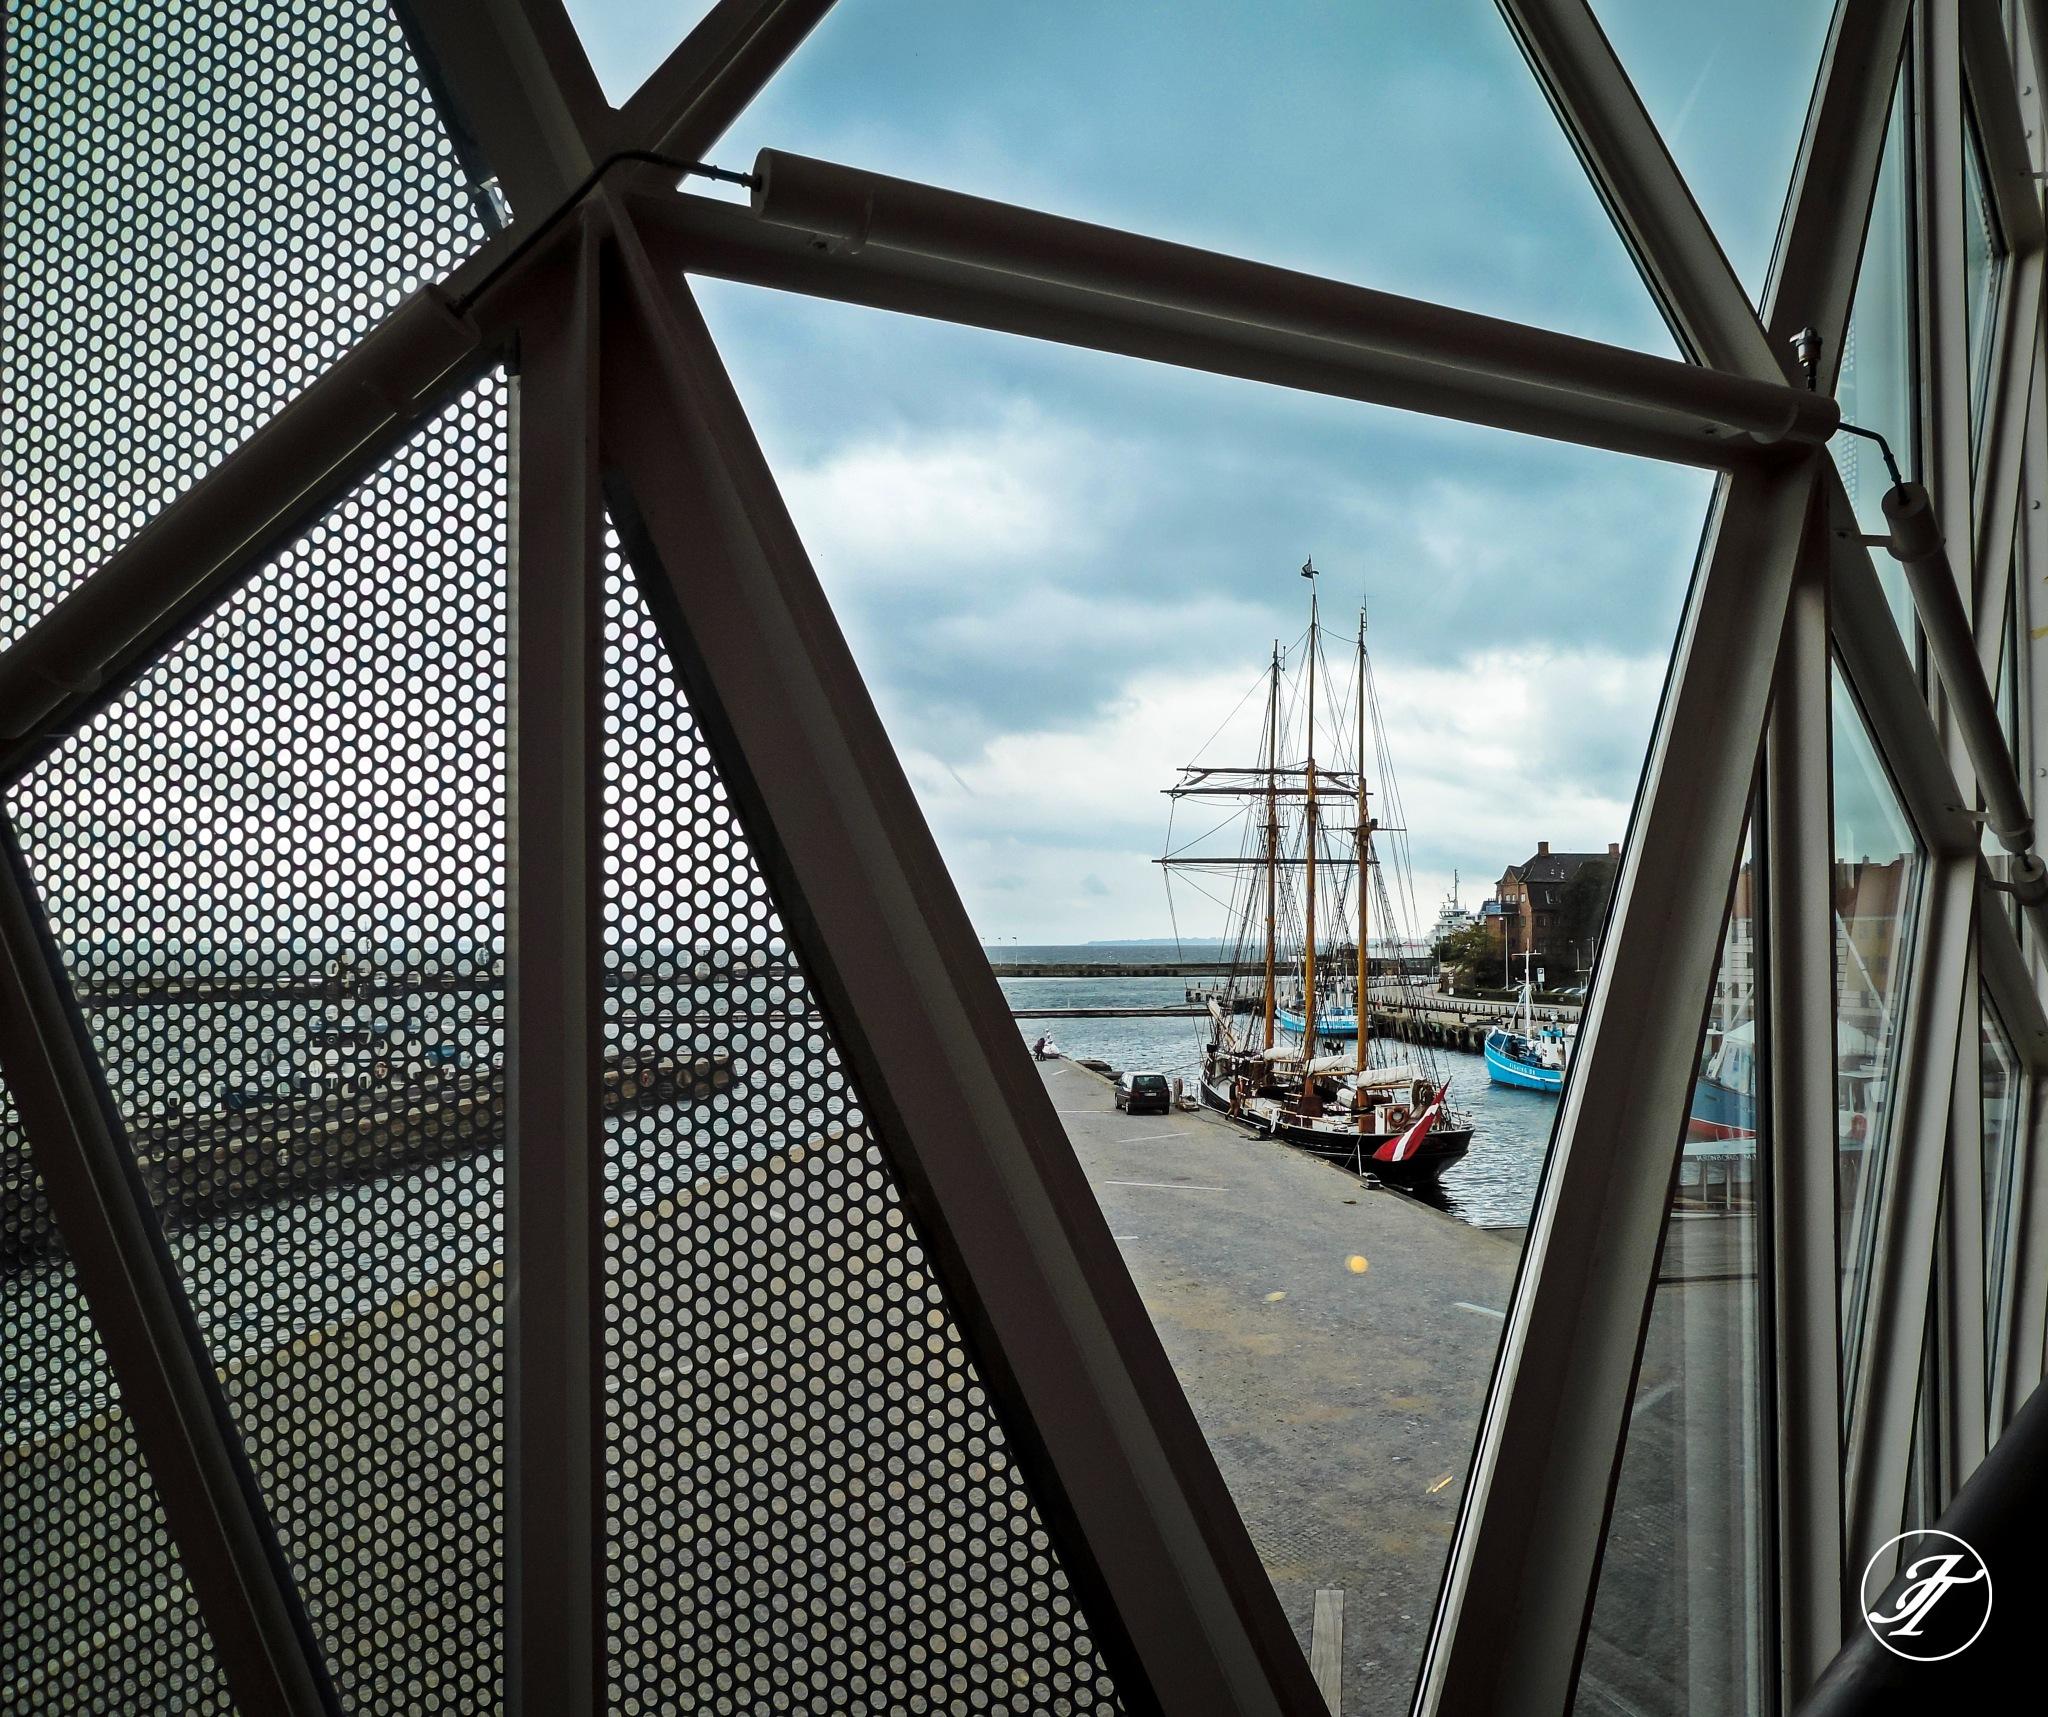 Helsingor port by Jasmin